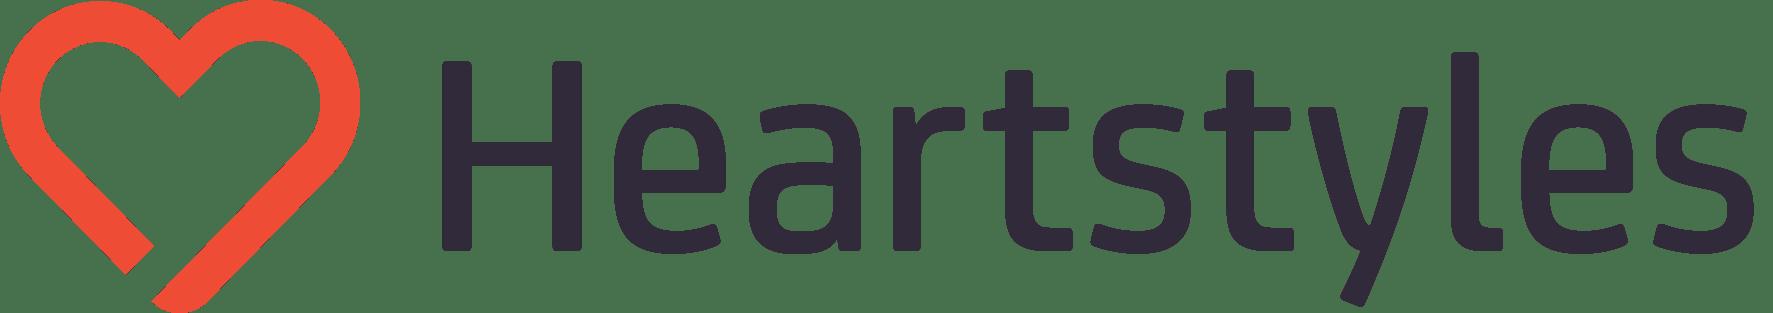 Heartstyles Logo